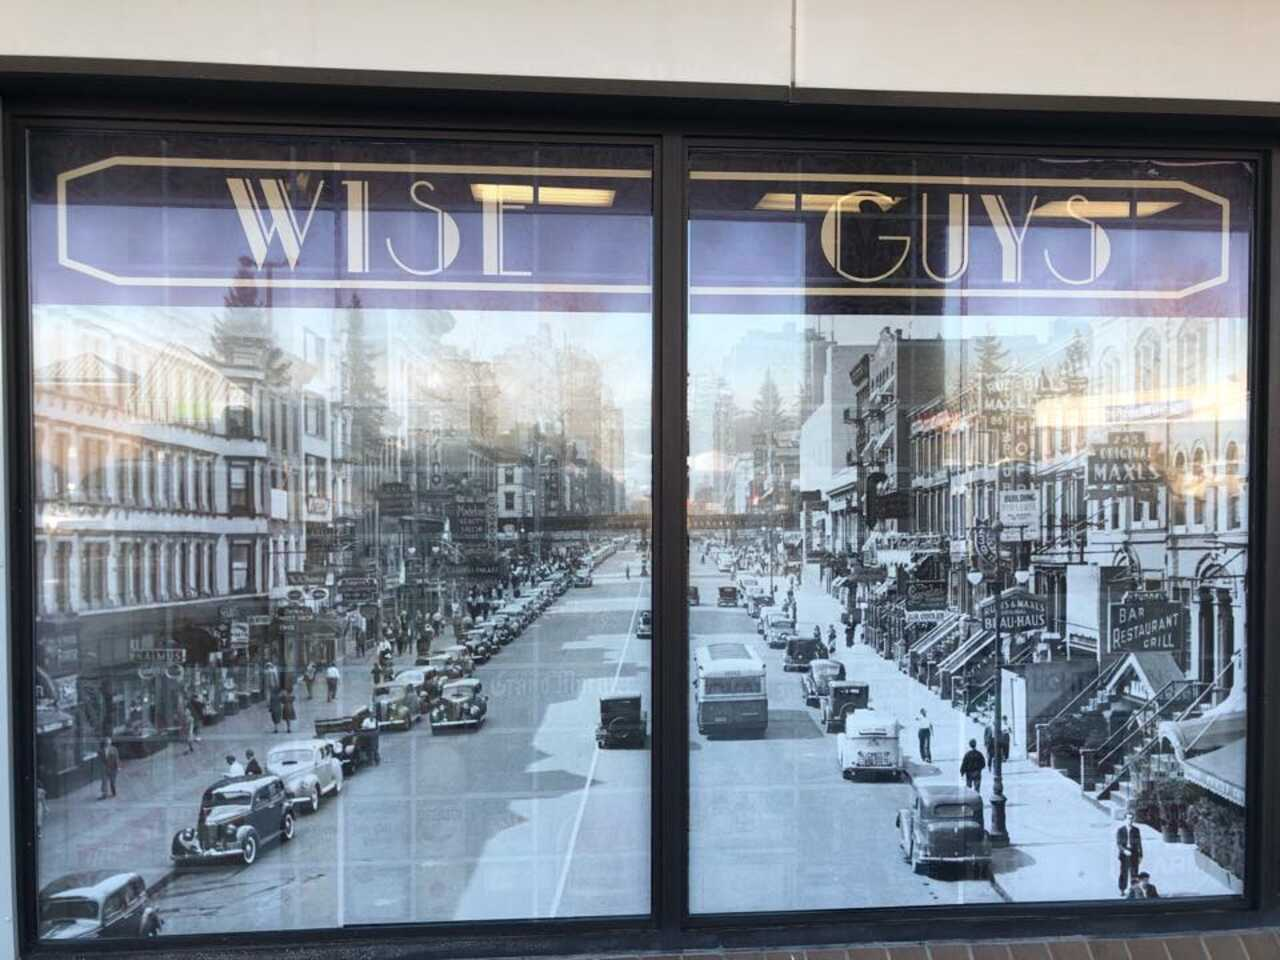 Wise Guys Liquor - Shopping - Liquor Stores in Calgary AB